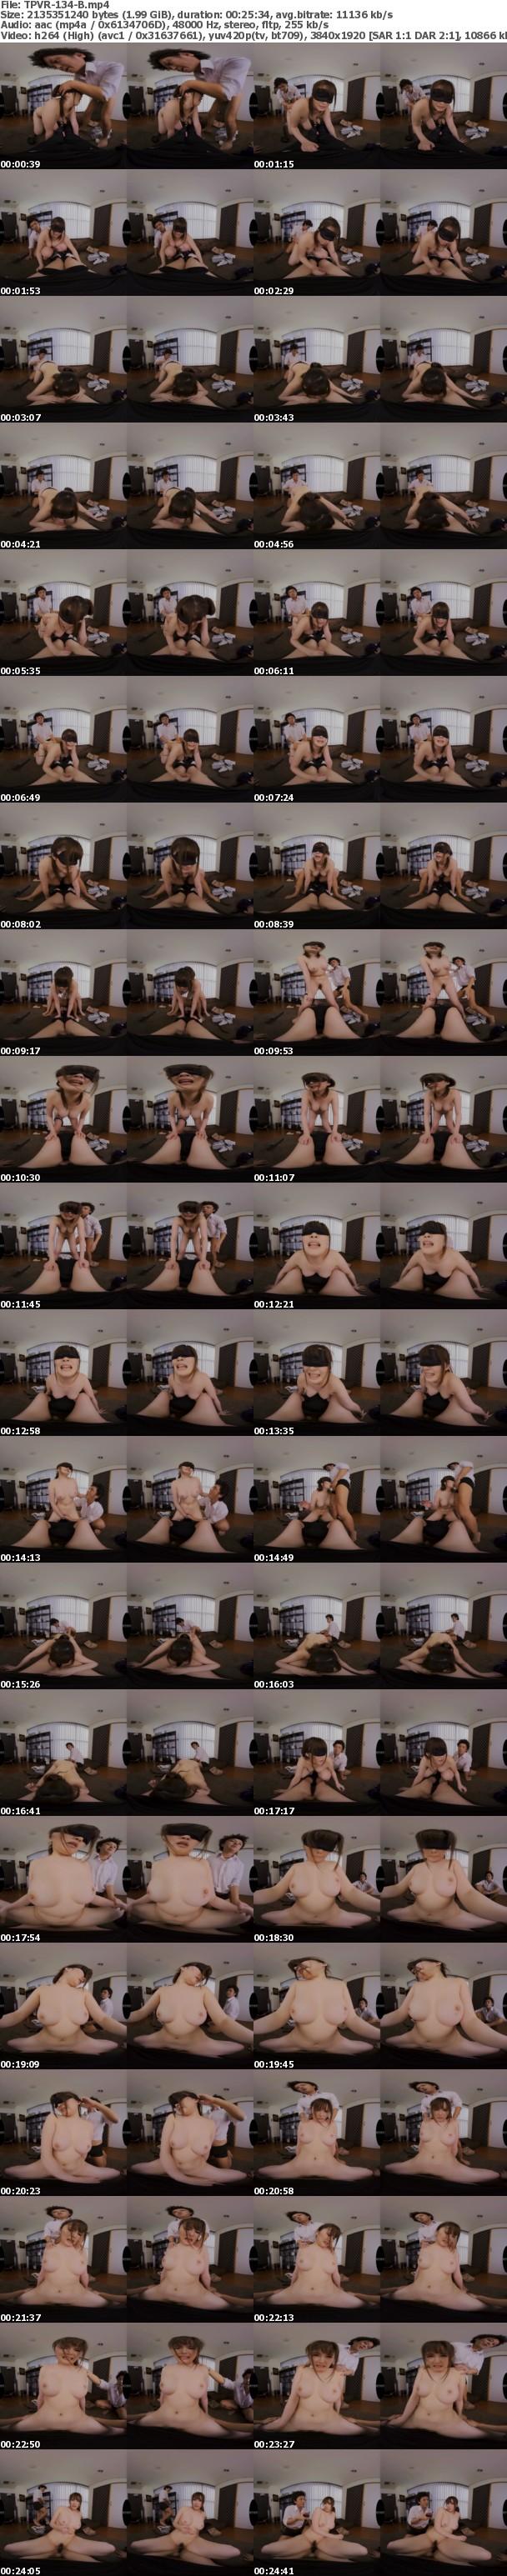 (VR) TPVR-134 Gcup巨乳 目の前で姉がレ×プ凌● さらに近親相姦3P!! 2 「ううぅぅ…オマ○コ気持ちイイ…イクゥ!」